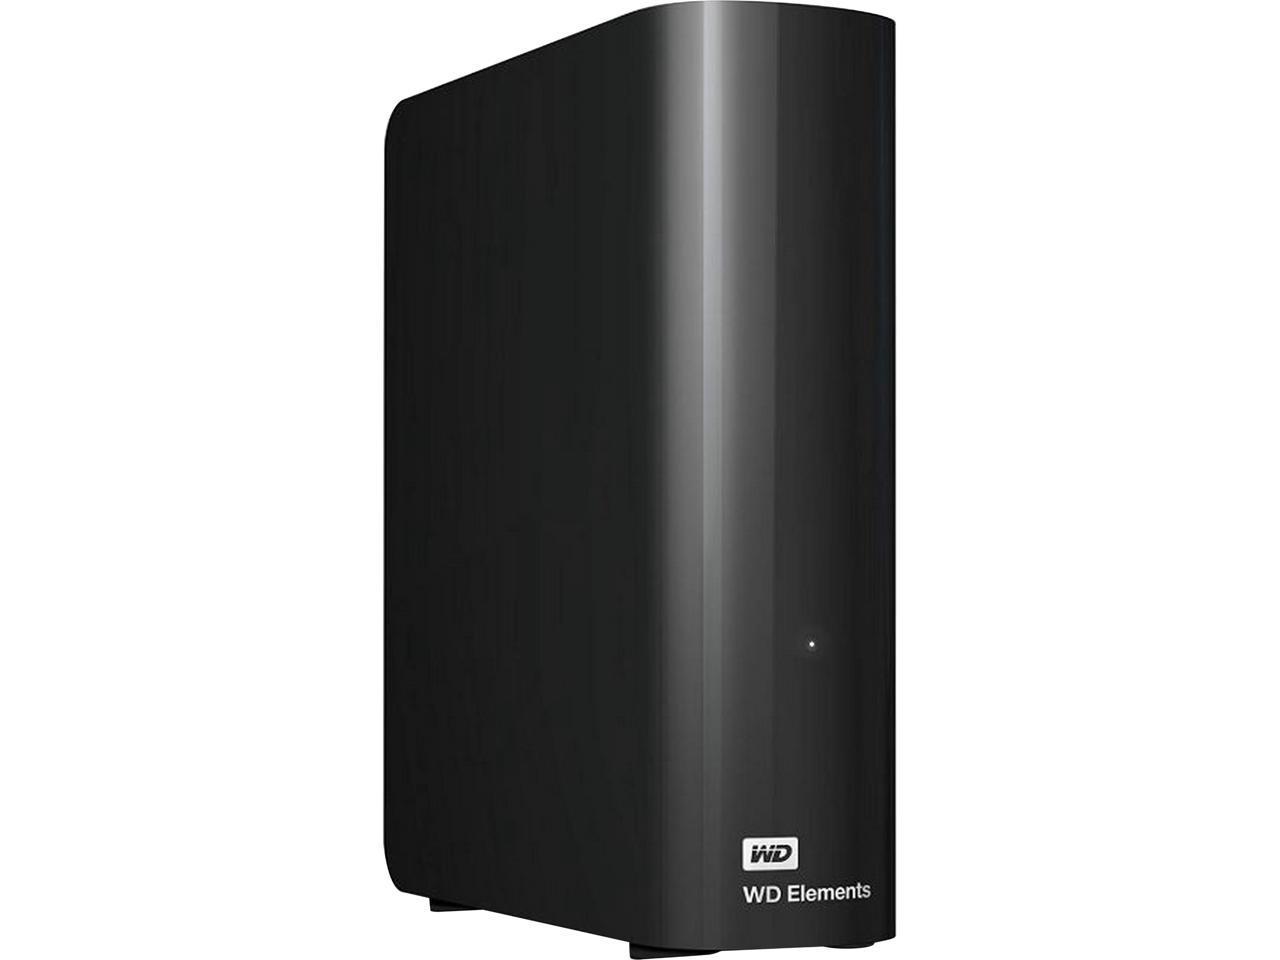 14TB Western Digital WD Elements External USB 3.0 Desktop Hard Drive (Black) $240 at Newegg